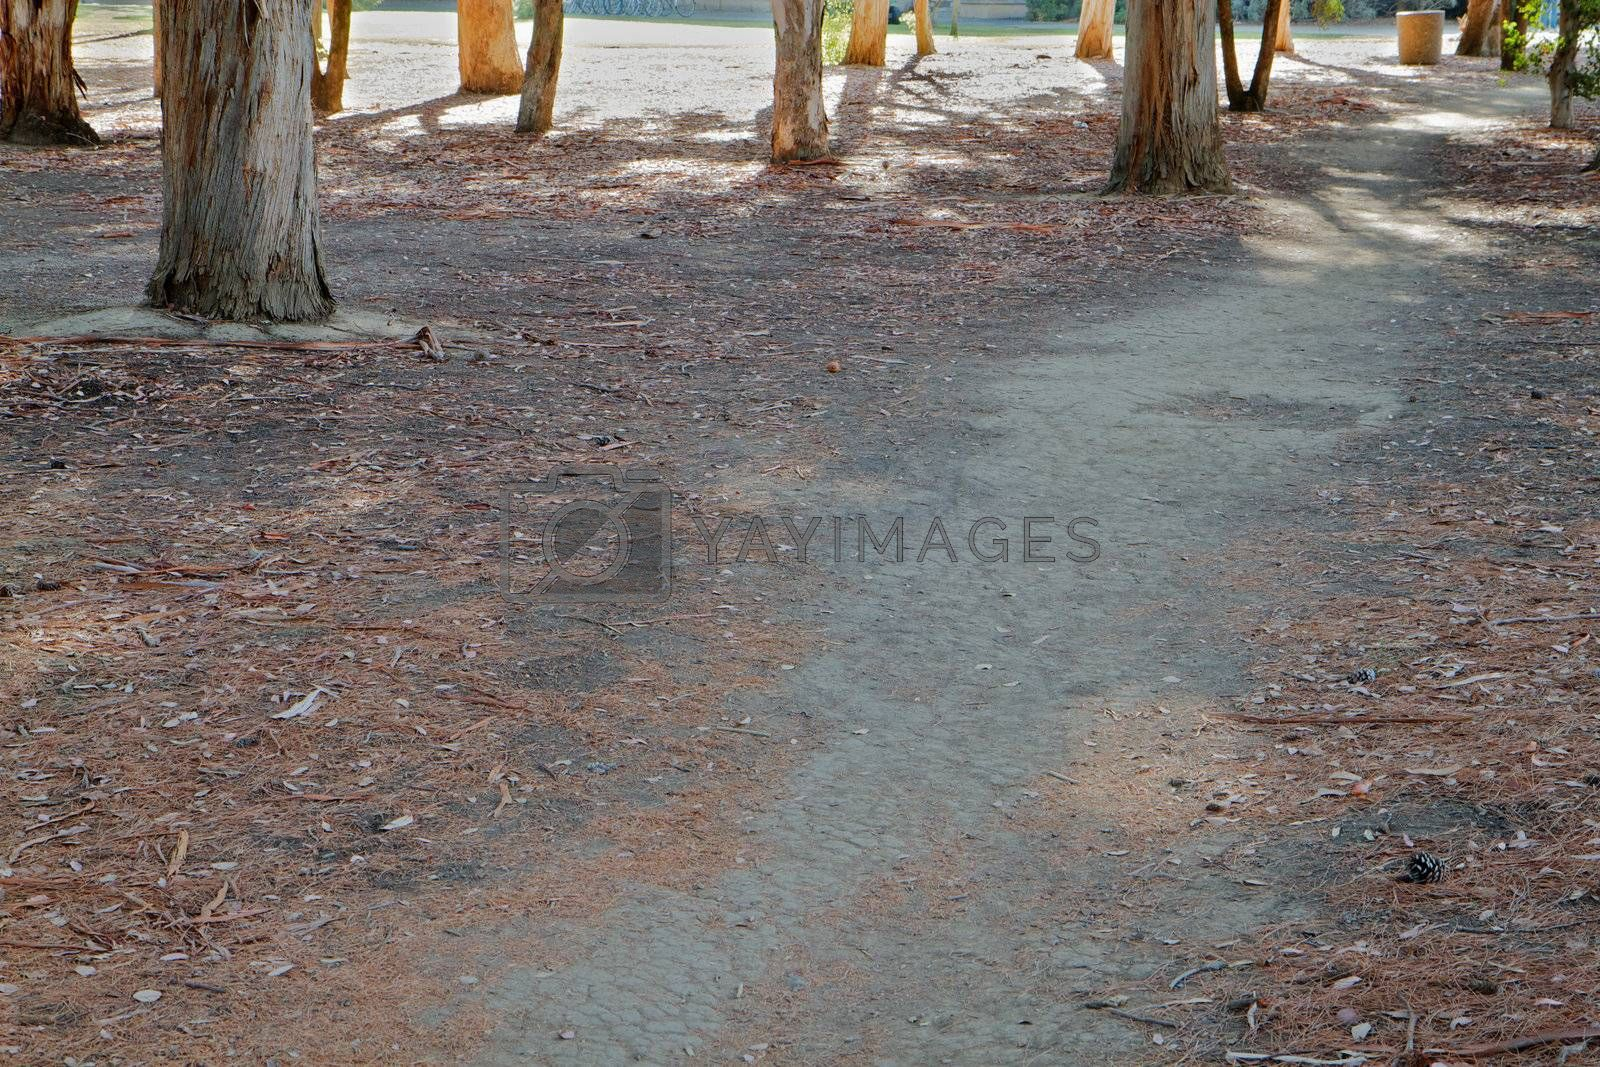 Royalty free image of Park dirt path by bobkeenan